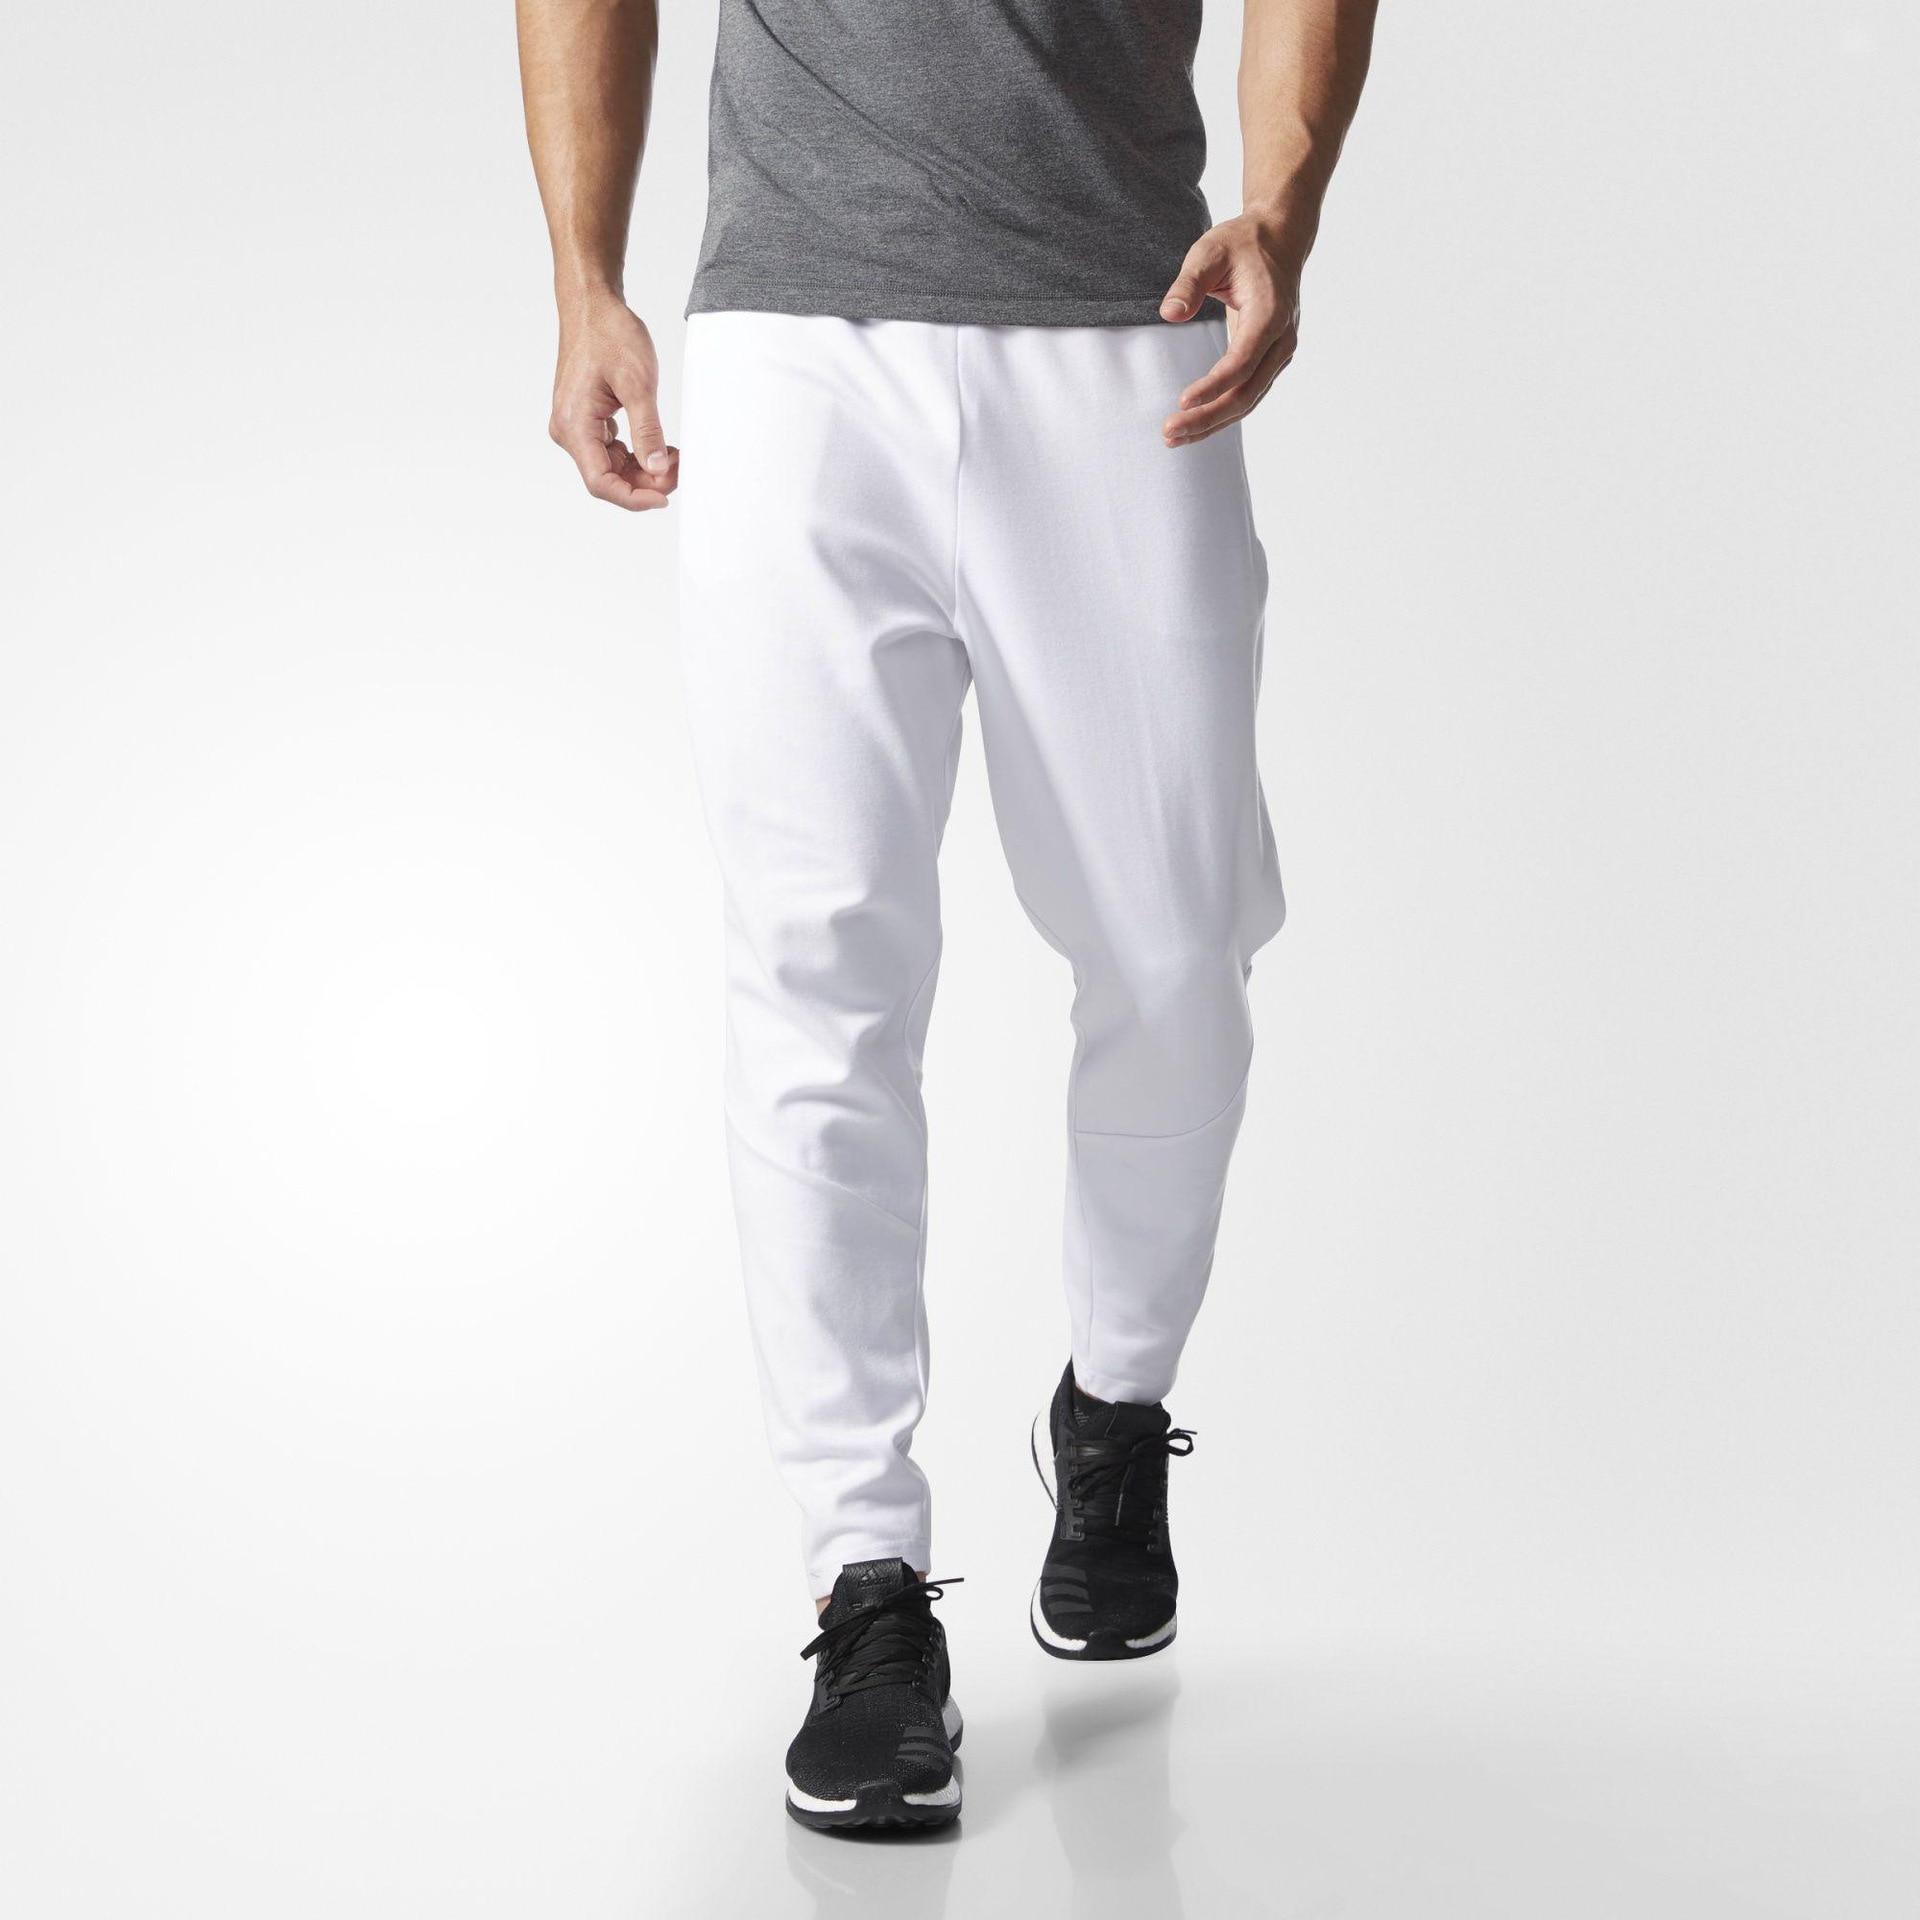 White Pants Men Streetwear Sweatpants Fashion Fitness Trousers Regular Spring Autumn Sport Training Pants Casual Straight Pants